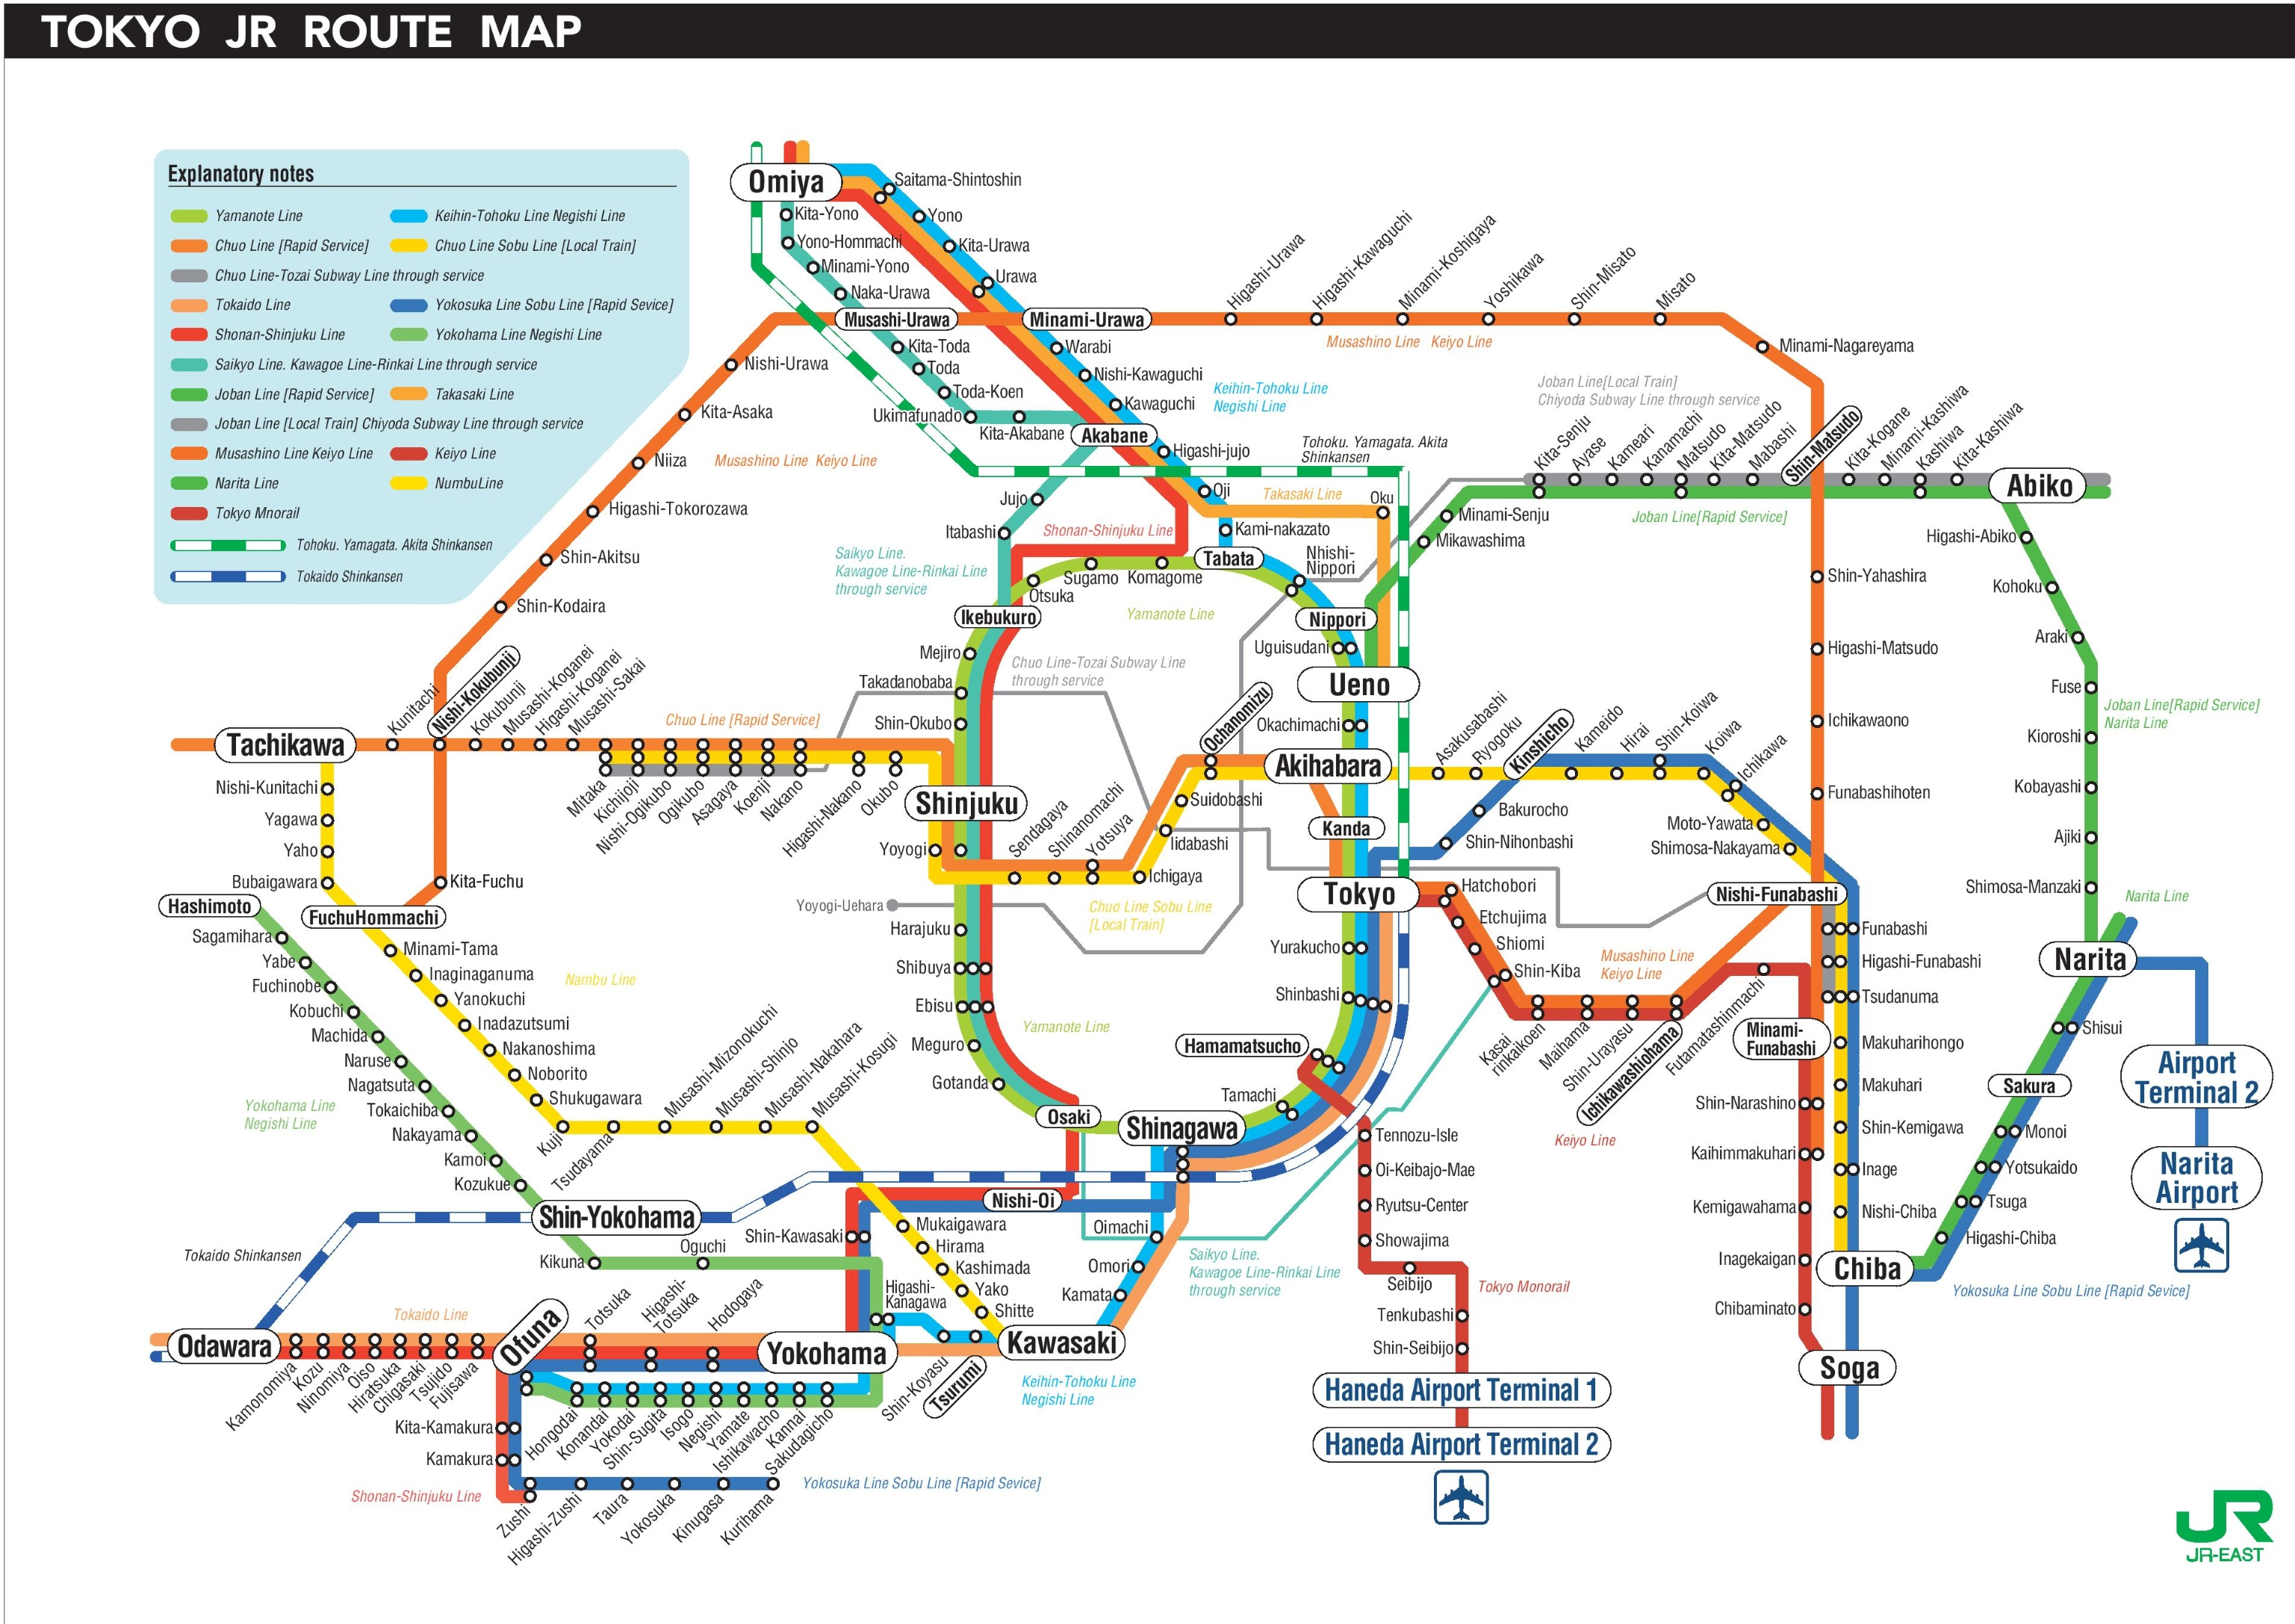 Tokyo JR map  on tokyo map pdf, japan metro map, japan bullet train map, best tokyo map, kyoto subway map, shinjuku tokyo map, tokyo train map, kyoto train station map, tokyo transit map, smt iv tokyo map, tokyo hr map, tokyo map english, shinkansen map, tokyo public transportation map, tokyo district map, tokyo jr line, honolulu bus route map, japan rail map, tokyo jr train, tokyo subway map,